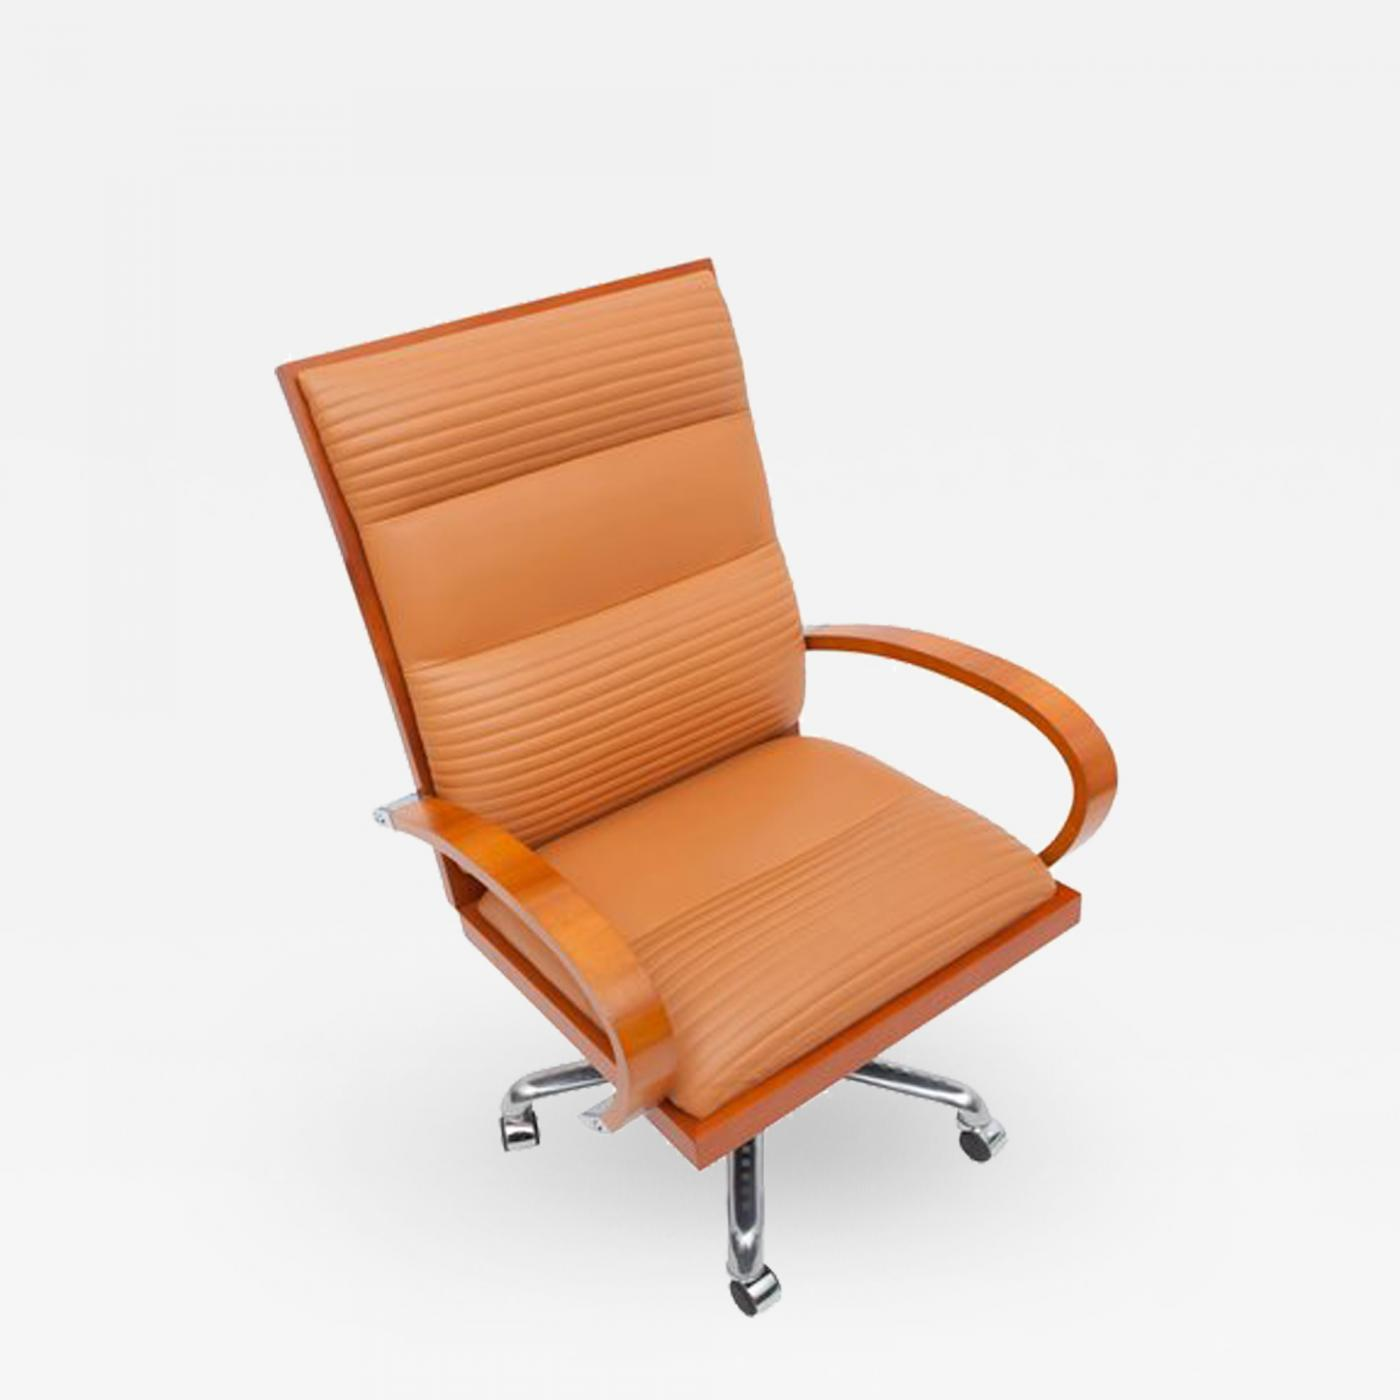 Peachy Jaime Tresserra Casablanca Managers Desk Chair By Tresserra 1987 Caraccident5 Cool Chair Designs And Ideas Caraccident5Info